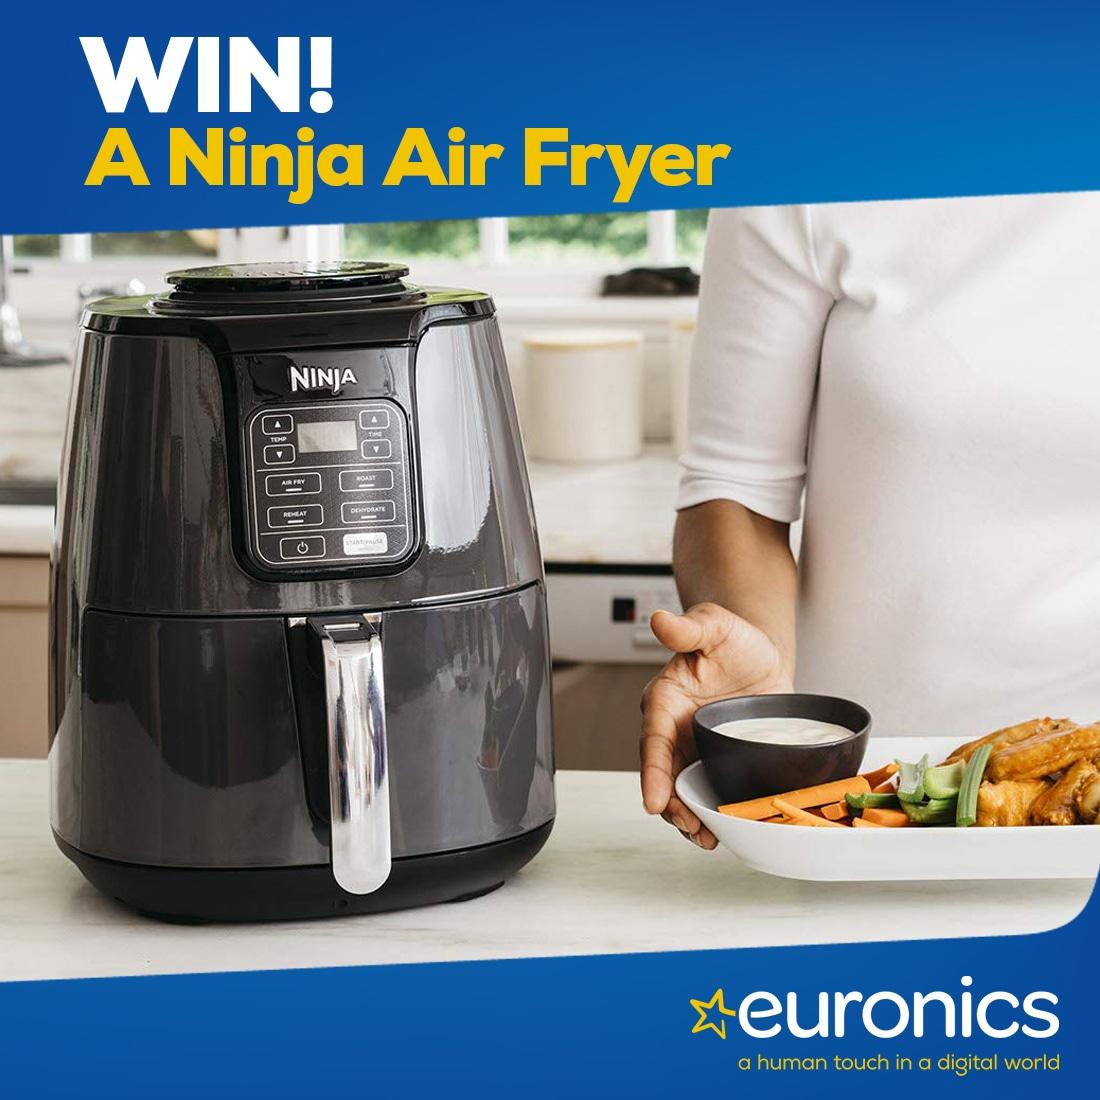 Win a Ninja Air Fryer